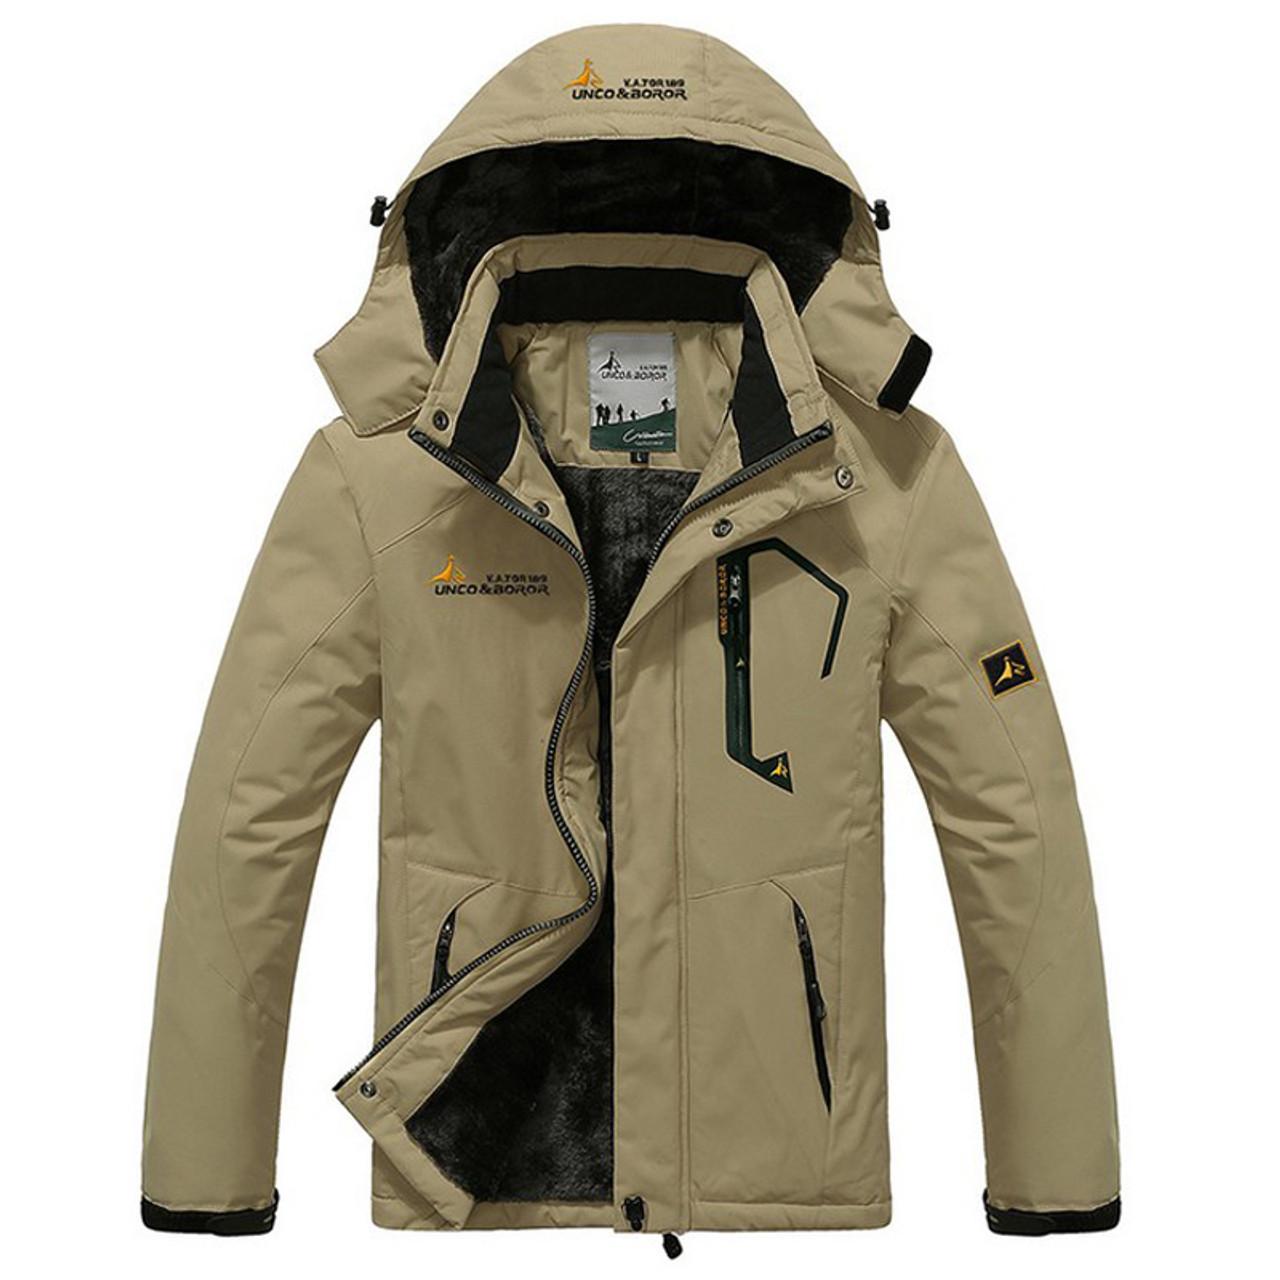 d98332e77802 ... New Winter Jacket Men Thick Velvet Warm Coat Thermal Warm Windproof  Hood Jackets Mens Outwear Parka ...